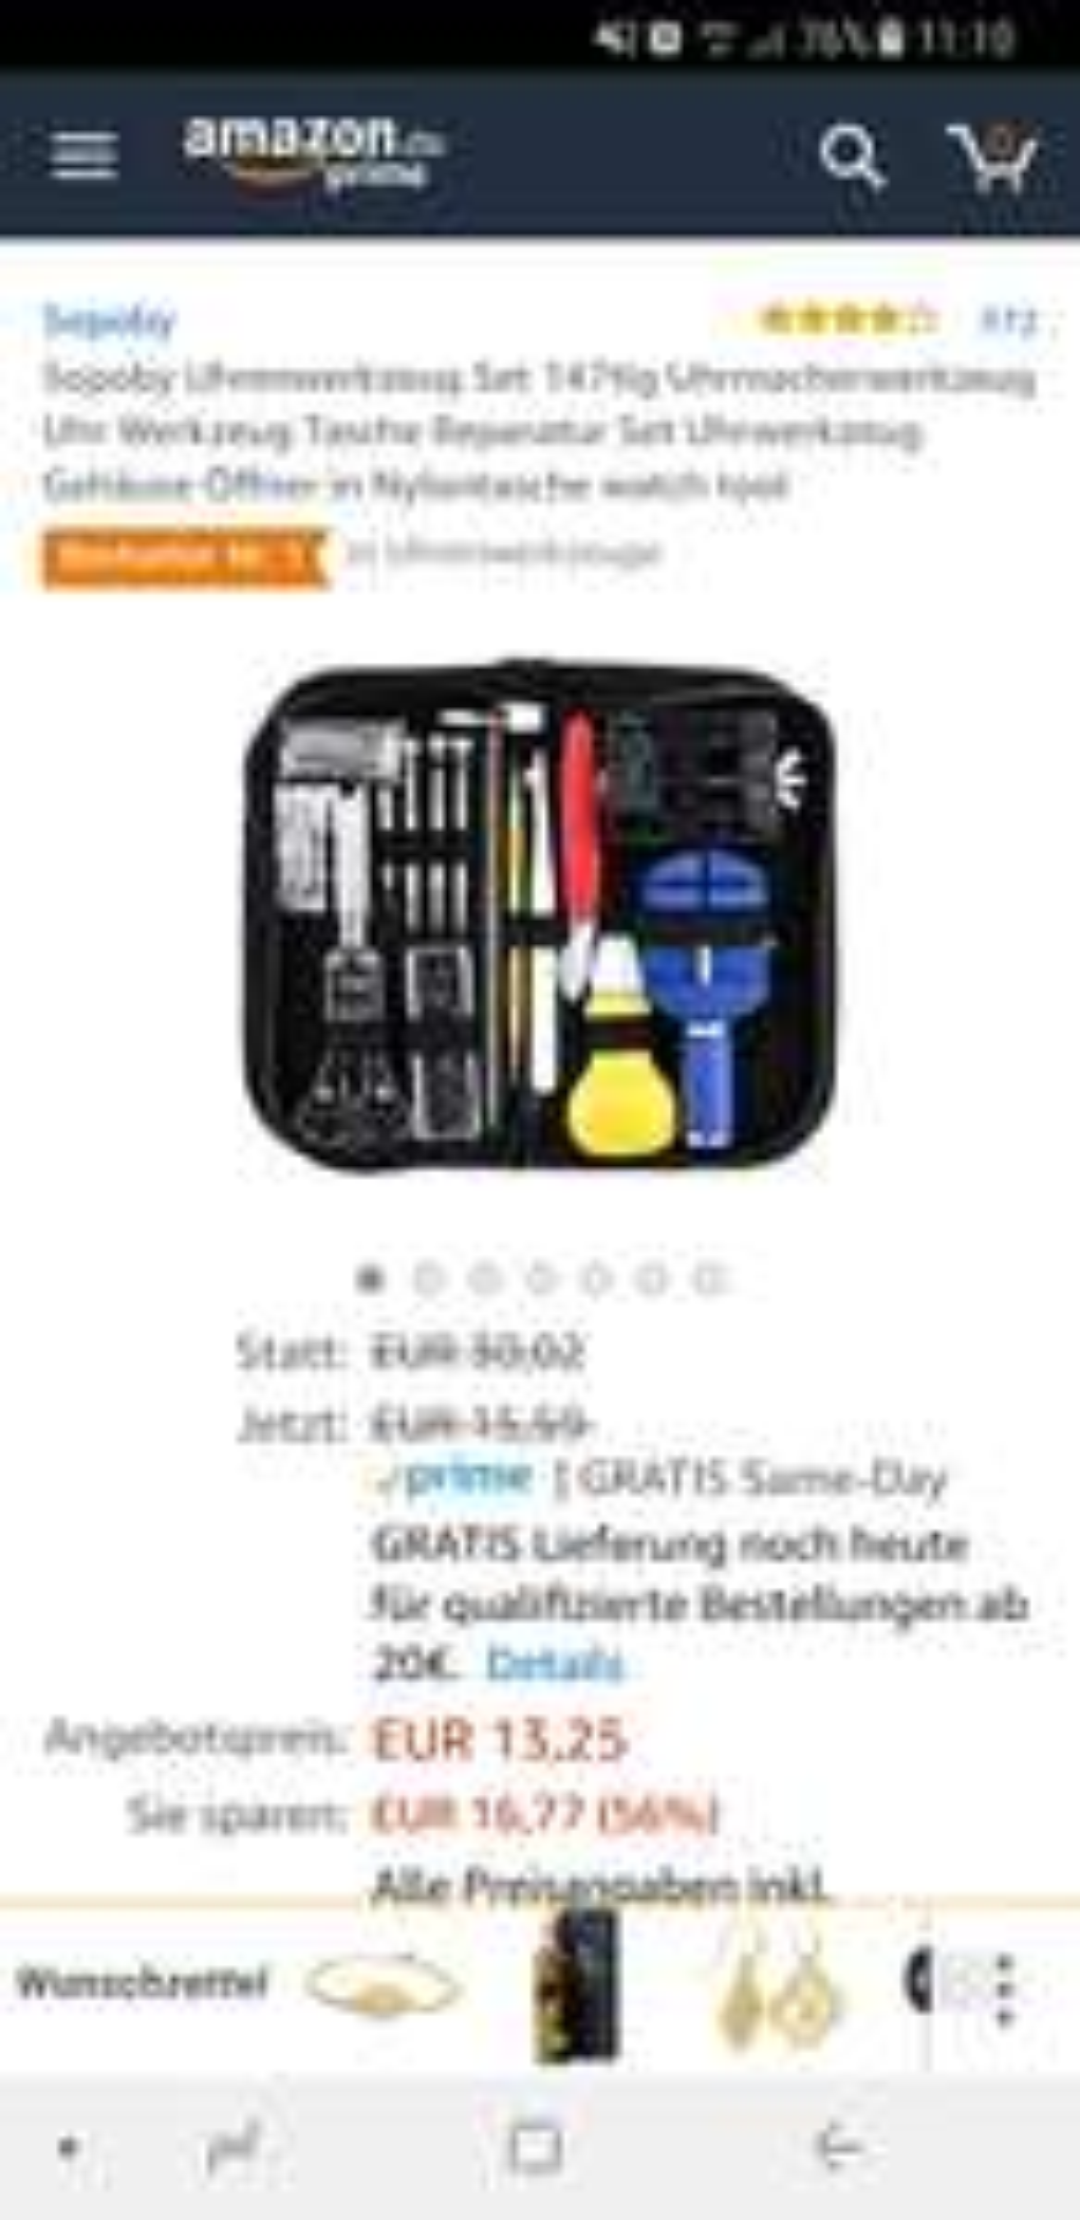 Uhrenwerkzeug - Amazon Blitzangebot